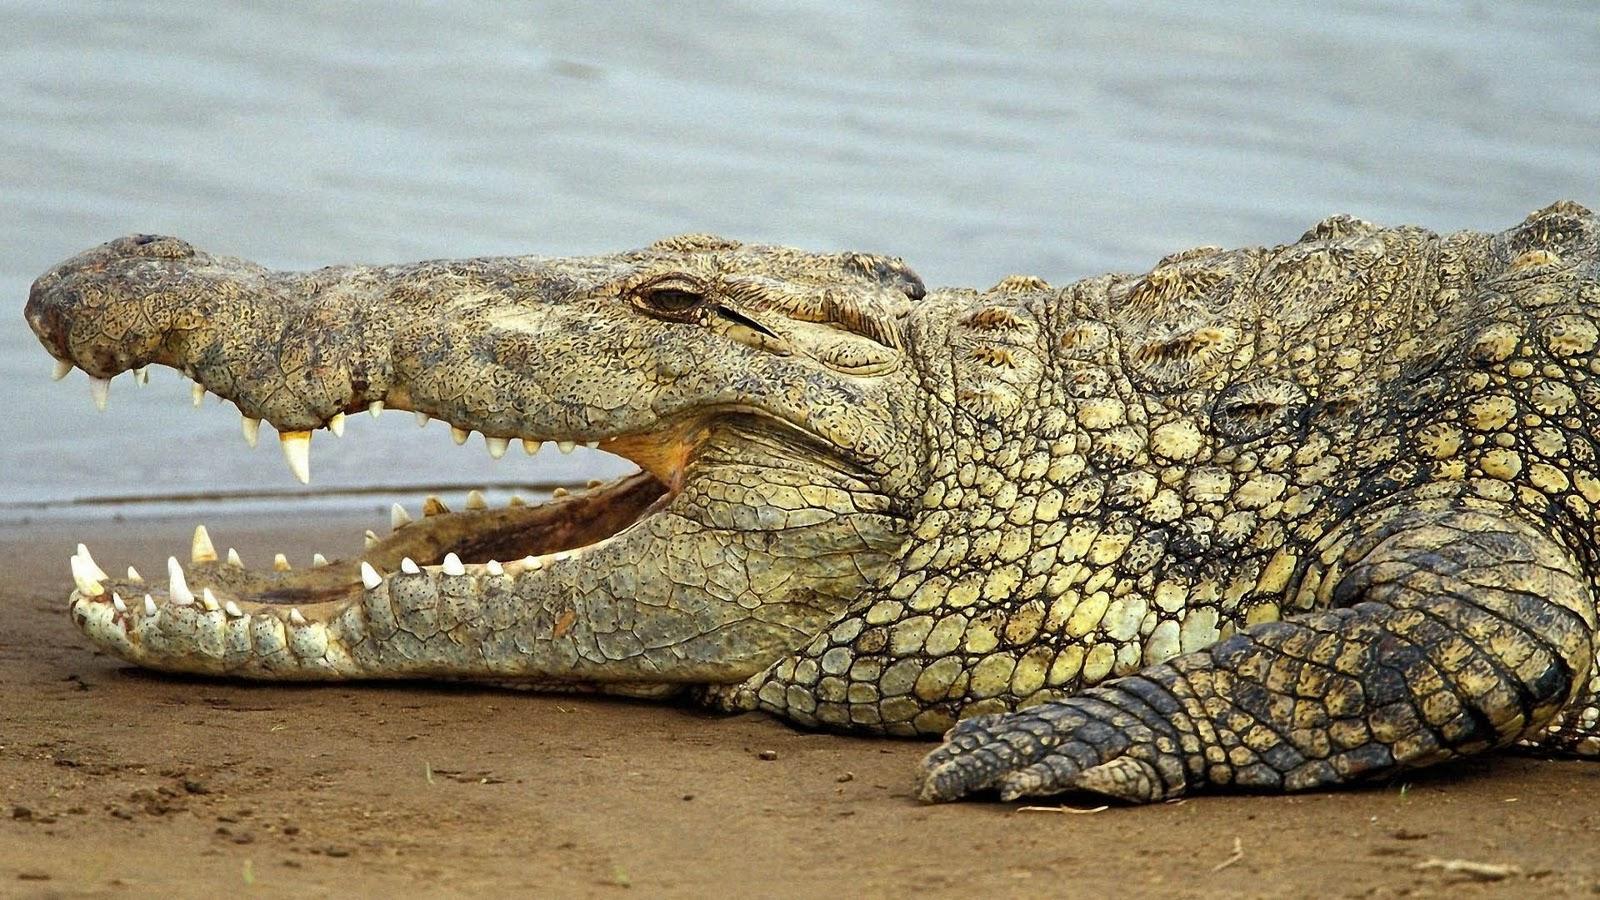 Krokodil Achtergronden   HD Wallpapers